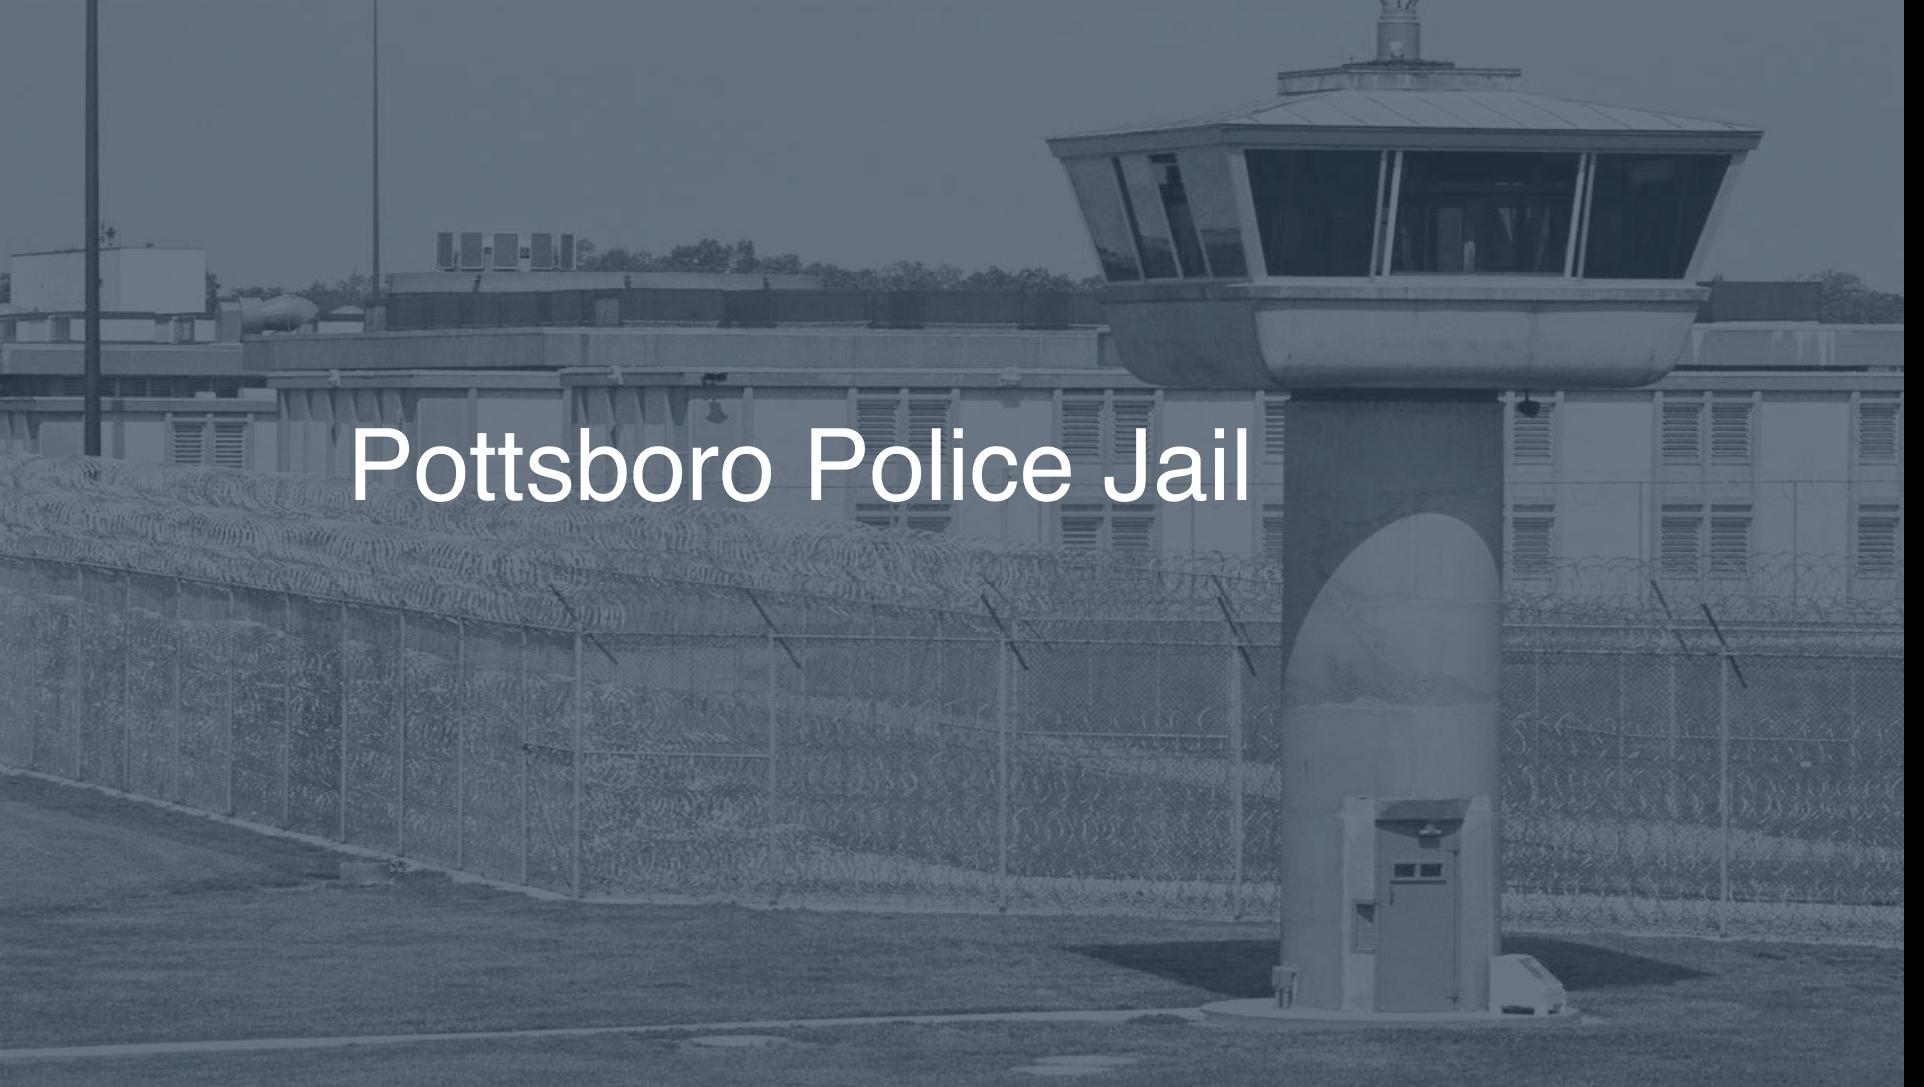 Pottsboro Police Jail correctional facility picture